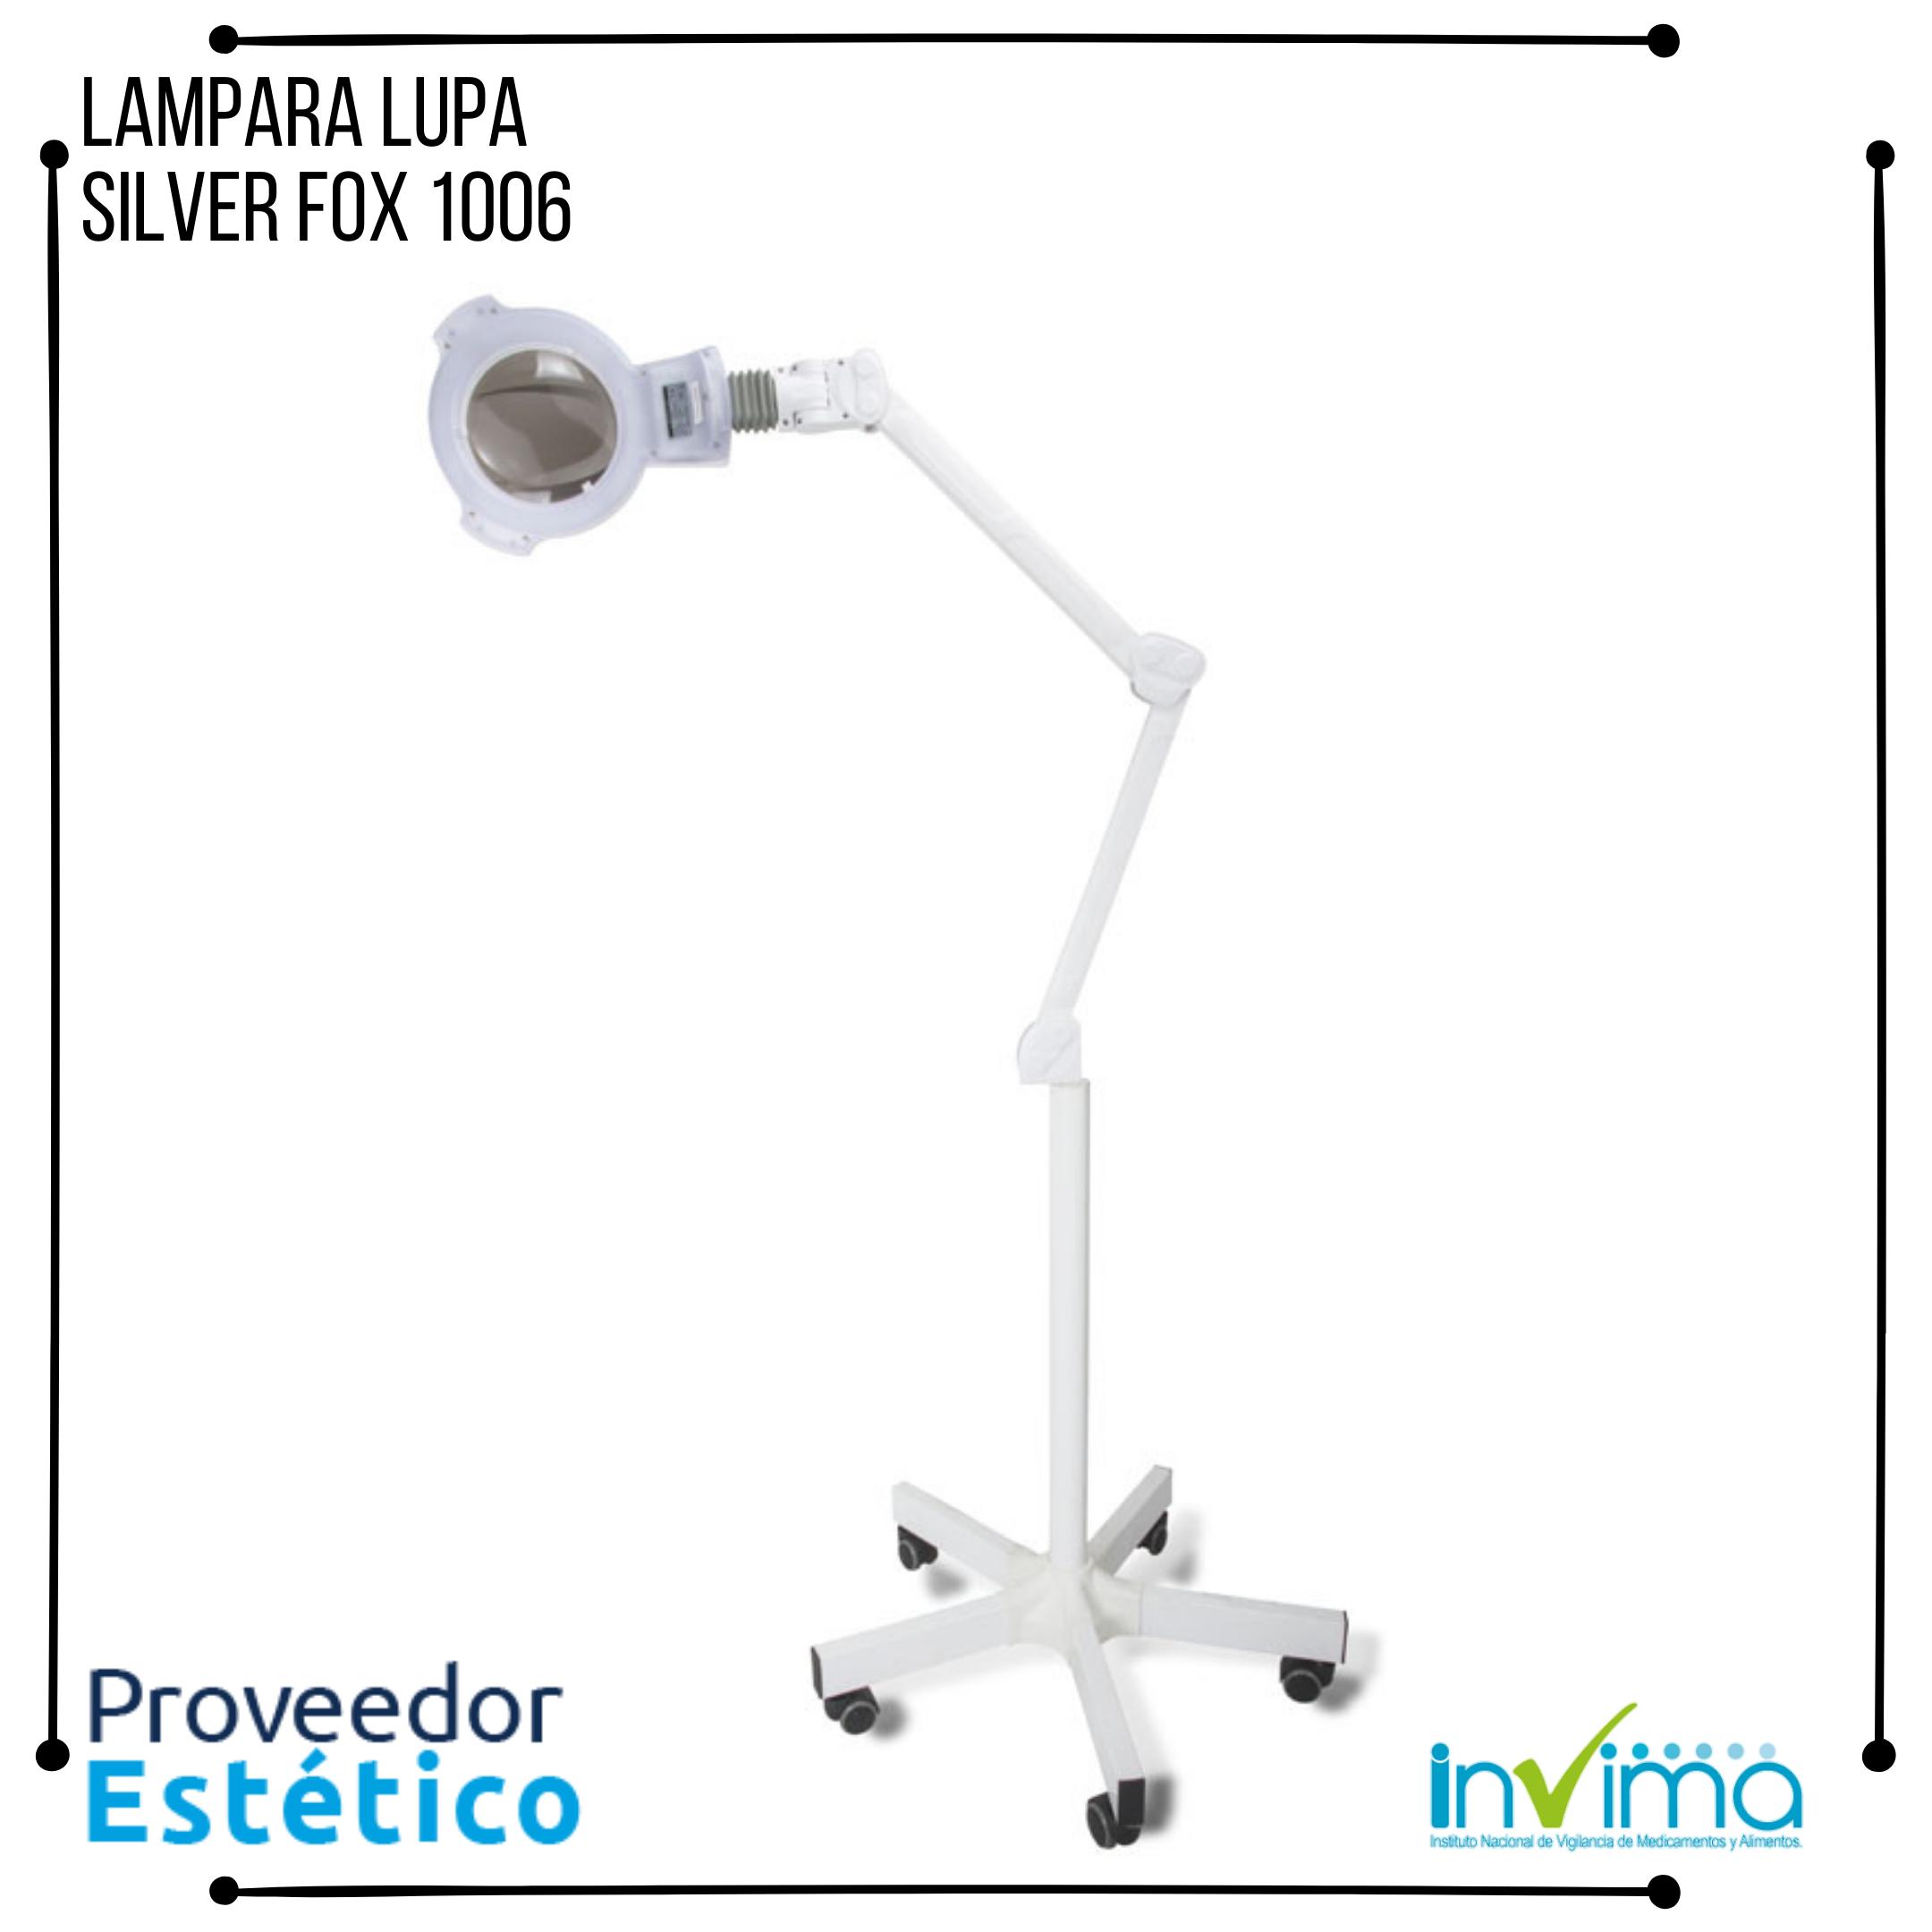 https://0201.nccdn.net/4_2/000/000/046/6ea/lampara-lupa-silver-fox-1006--4-.png